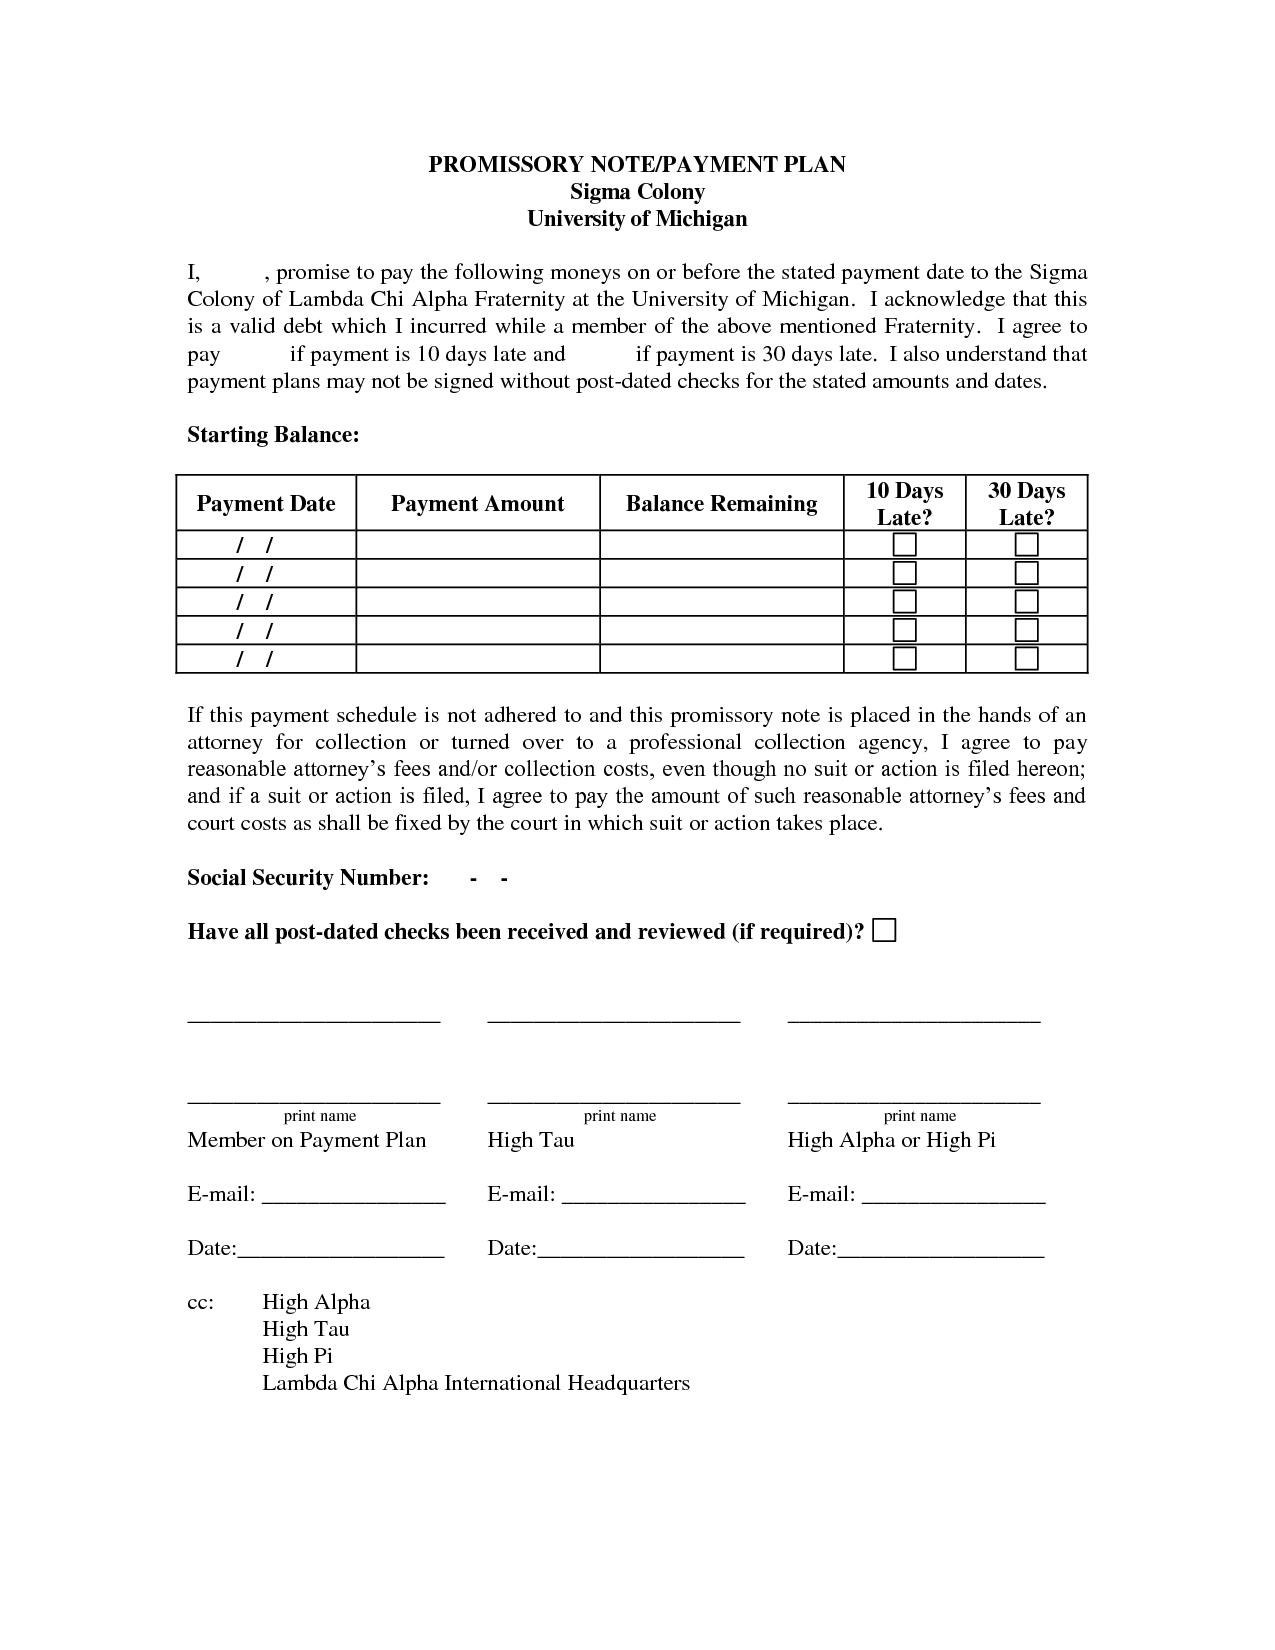 Payment Agreement Contract Template Plan Eehoa Alllona Sqaoj Pmt